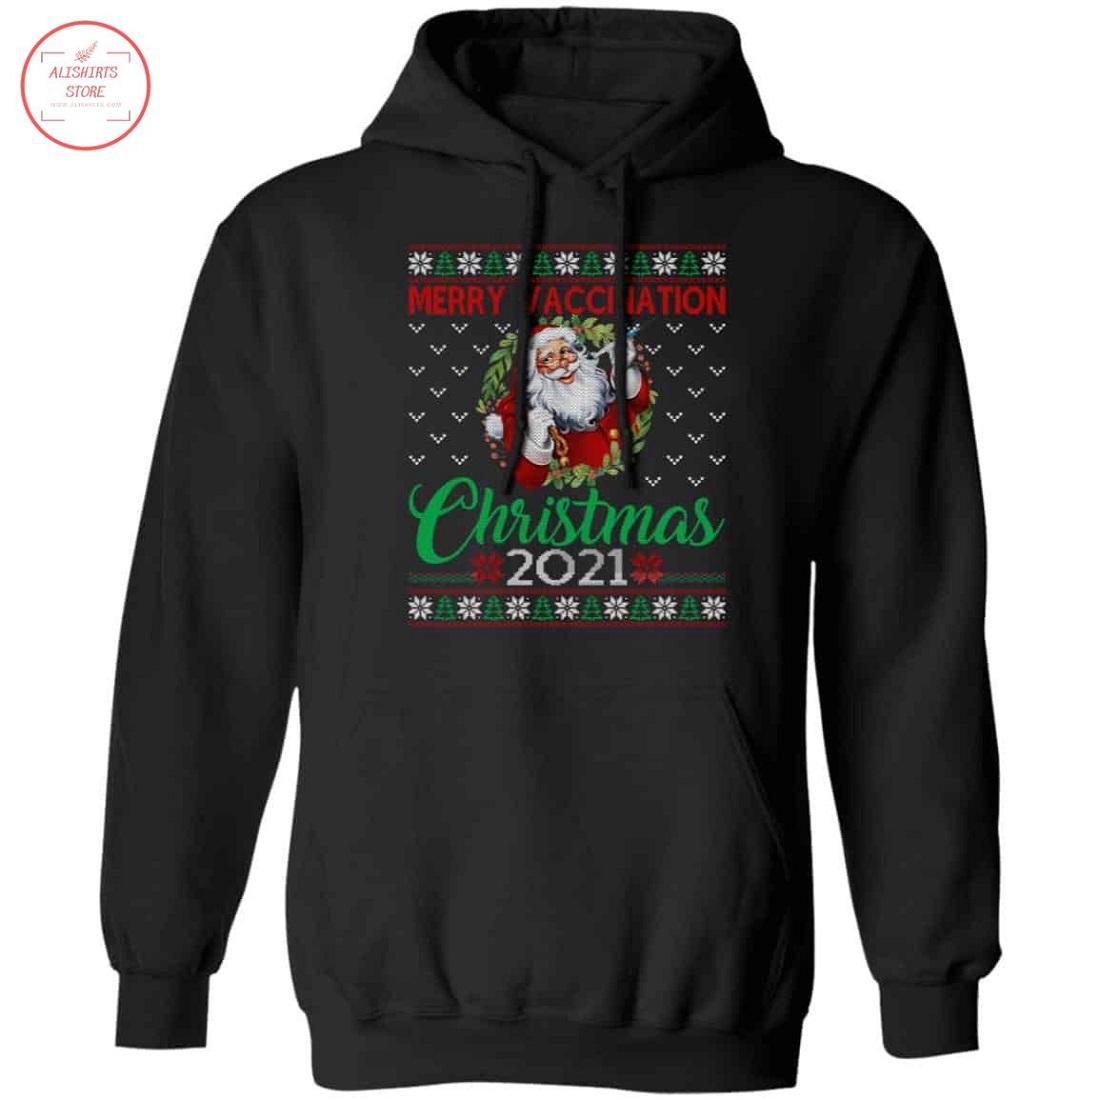 merry-quarantine-christmas-2021-funny-t-shirt